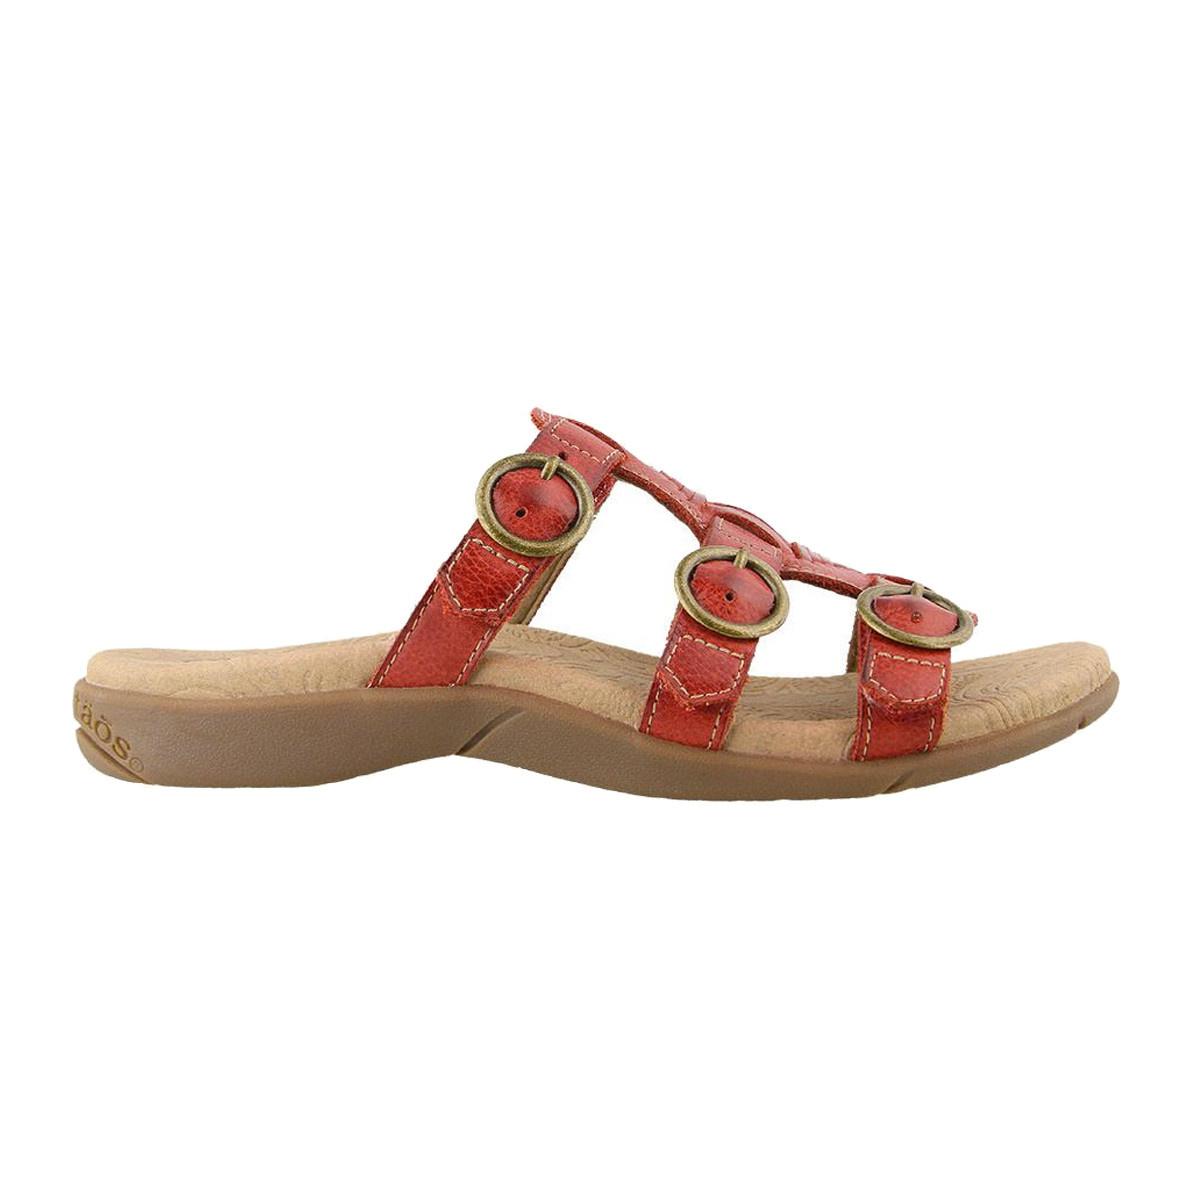 Taos Footwear Taos Women's Good Times Sandal